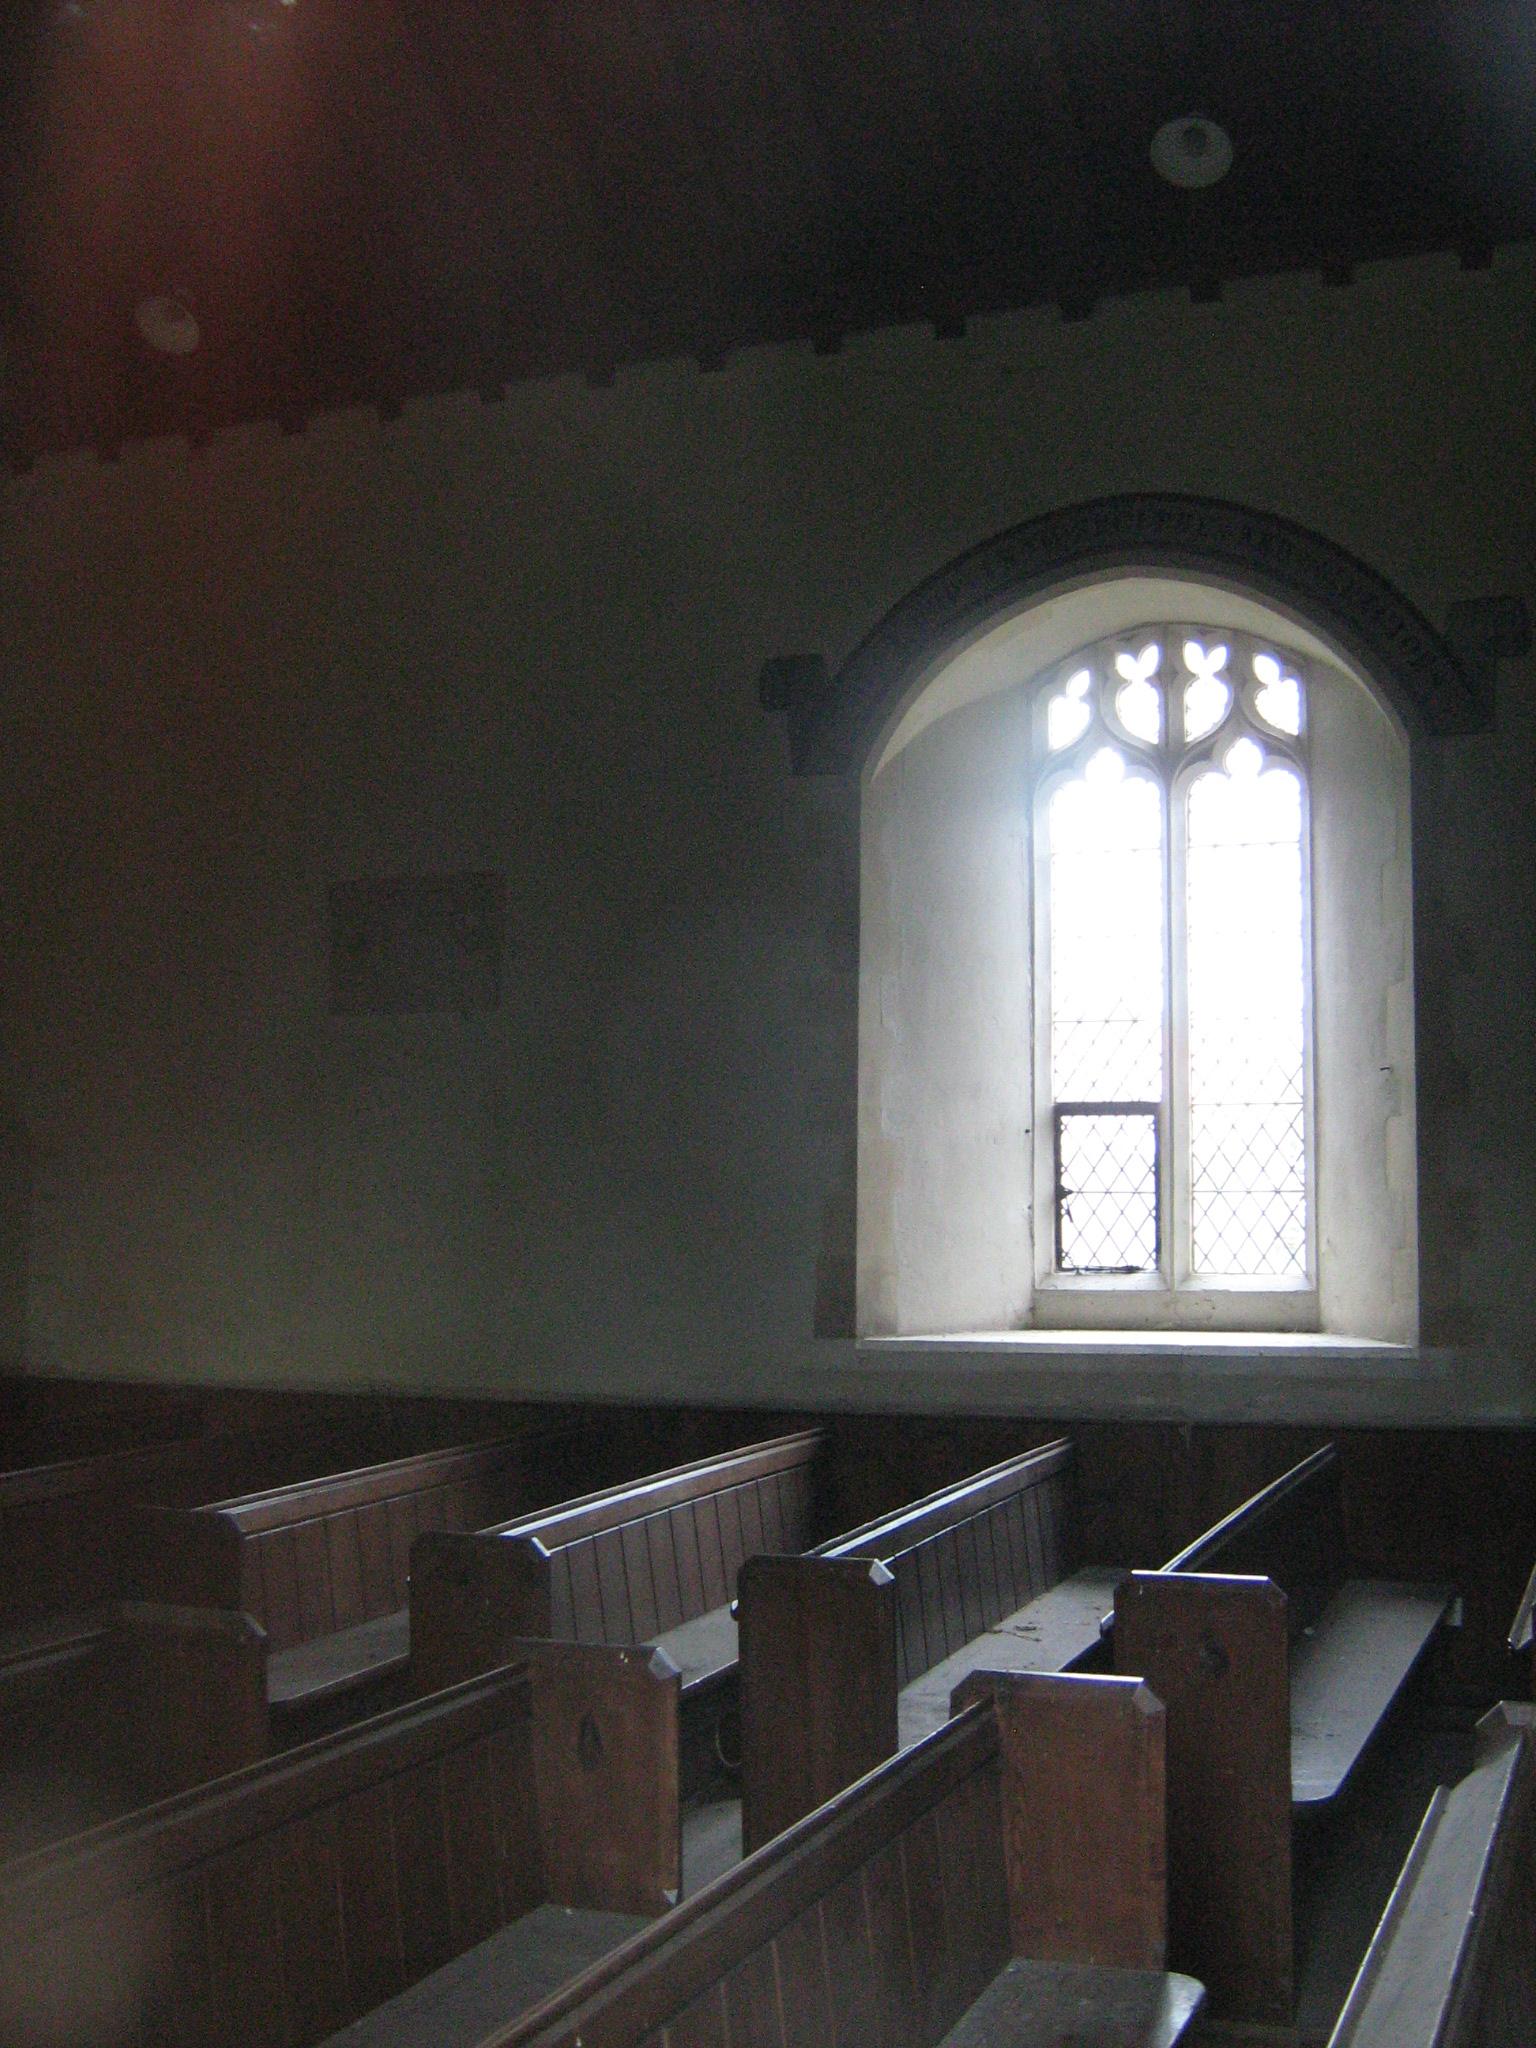 Kalvos - inside Saint Margaret´s Church - on the wall sign of memorial plaque - photo Zafiriou IMG_9741